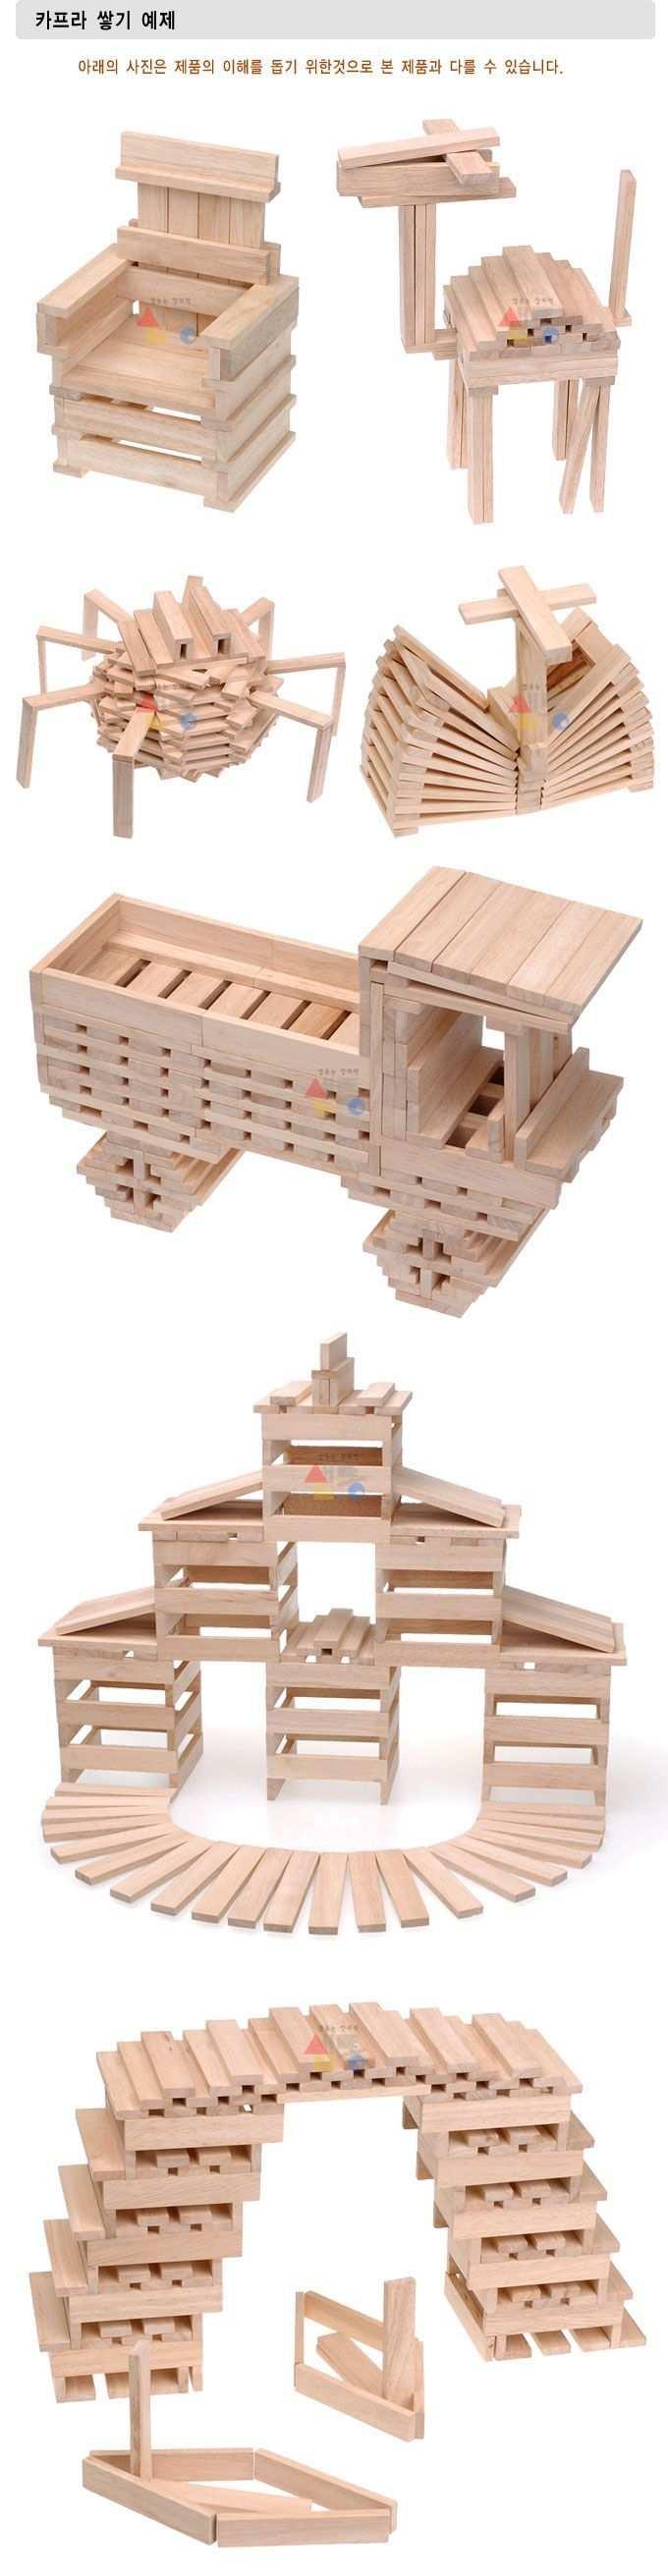 Ateliers Autonomes Montessori Construction For Kids Keva Planks Diy For Kids